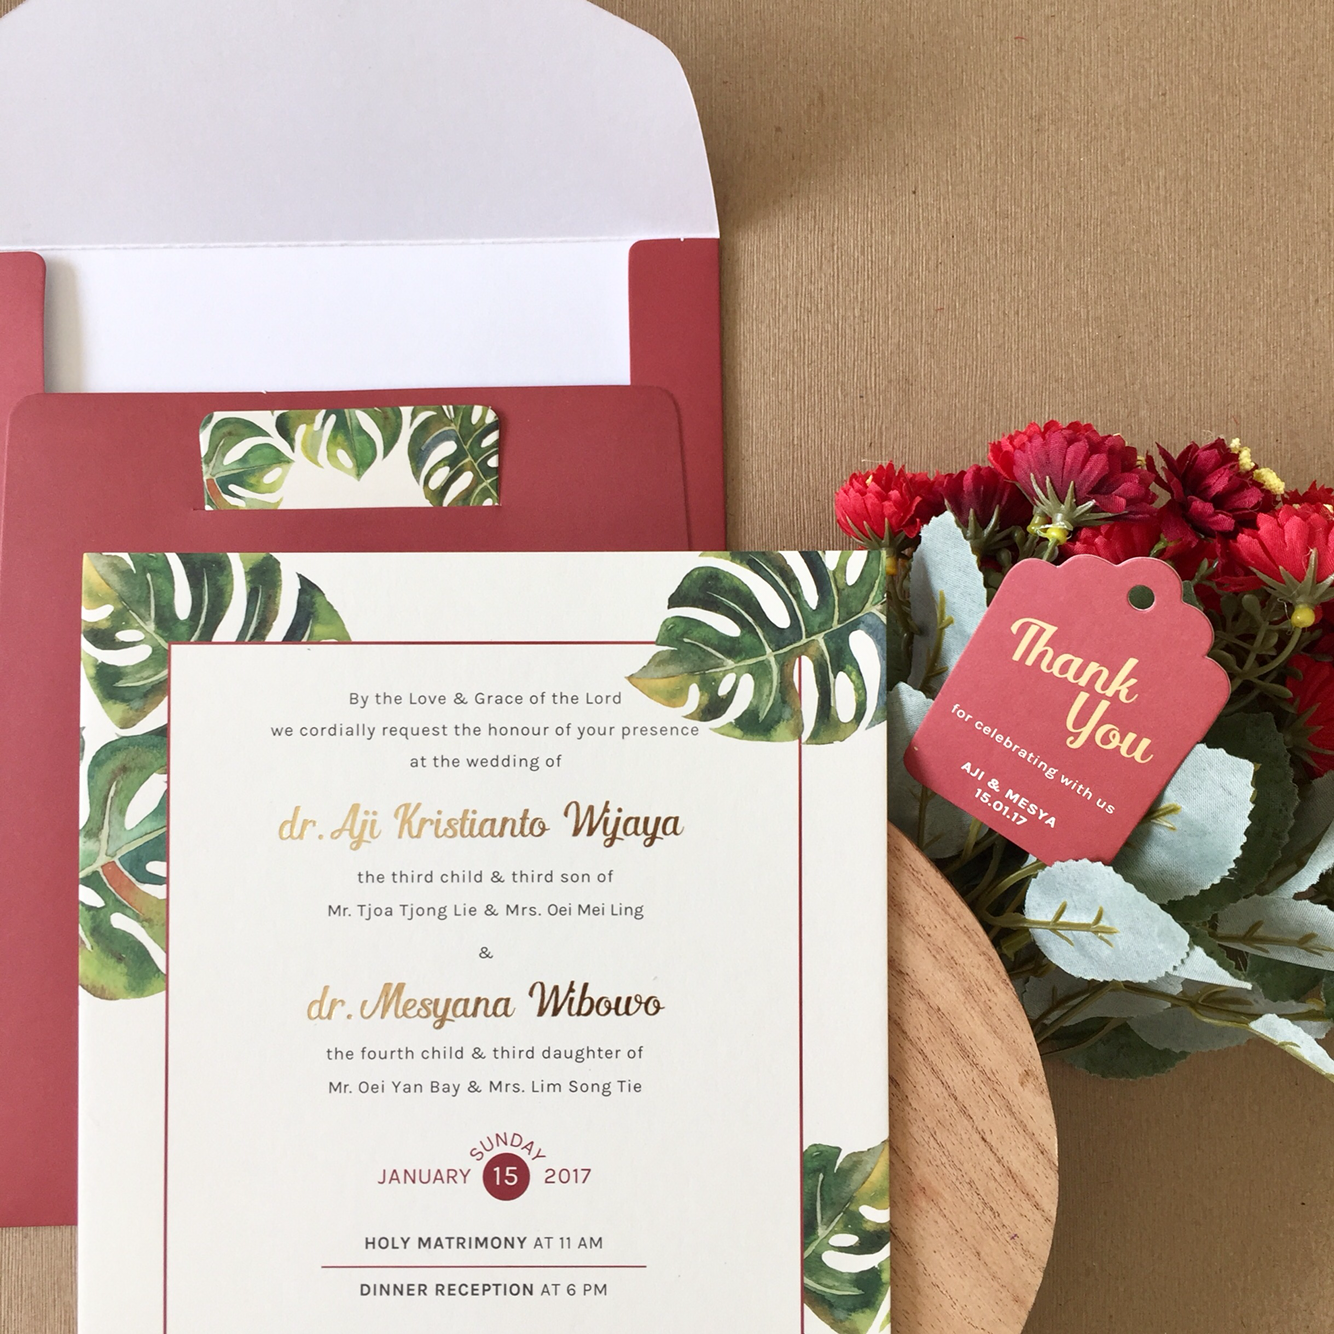 Directory of Wedding Invitations Vendors in Surabaya | Bridestory.com